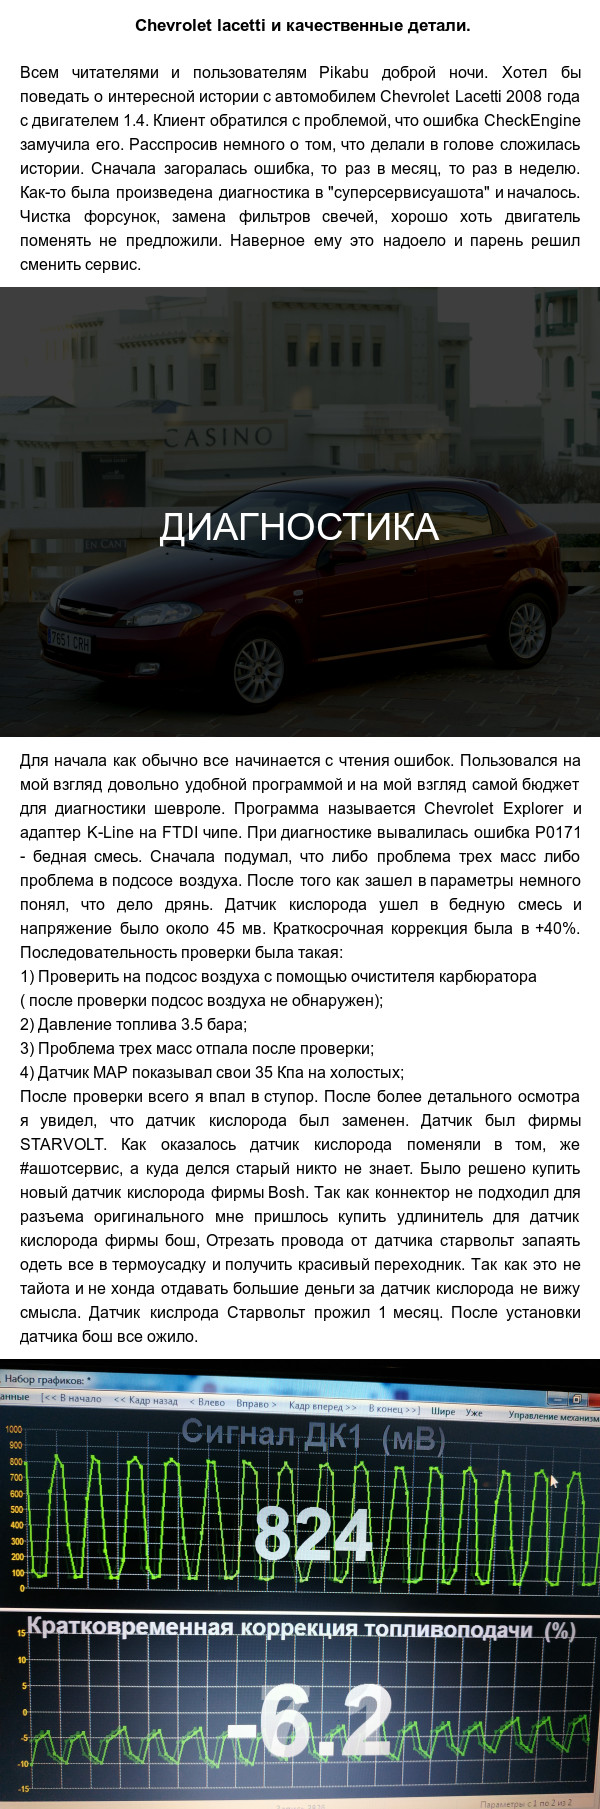 Chevrolet Lacetti Датчик Кислорода Компьютерная диагностика, Автоэлектрика, Длиннопост, Chevrolet